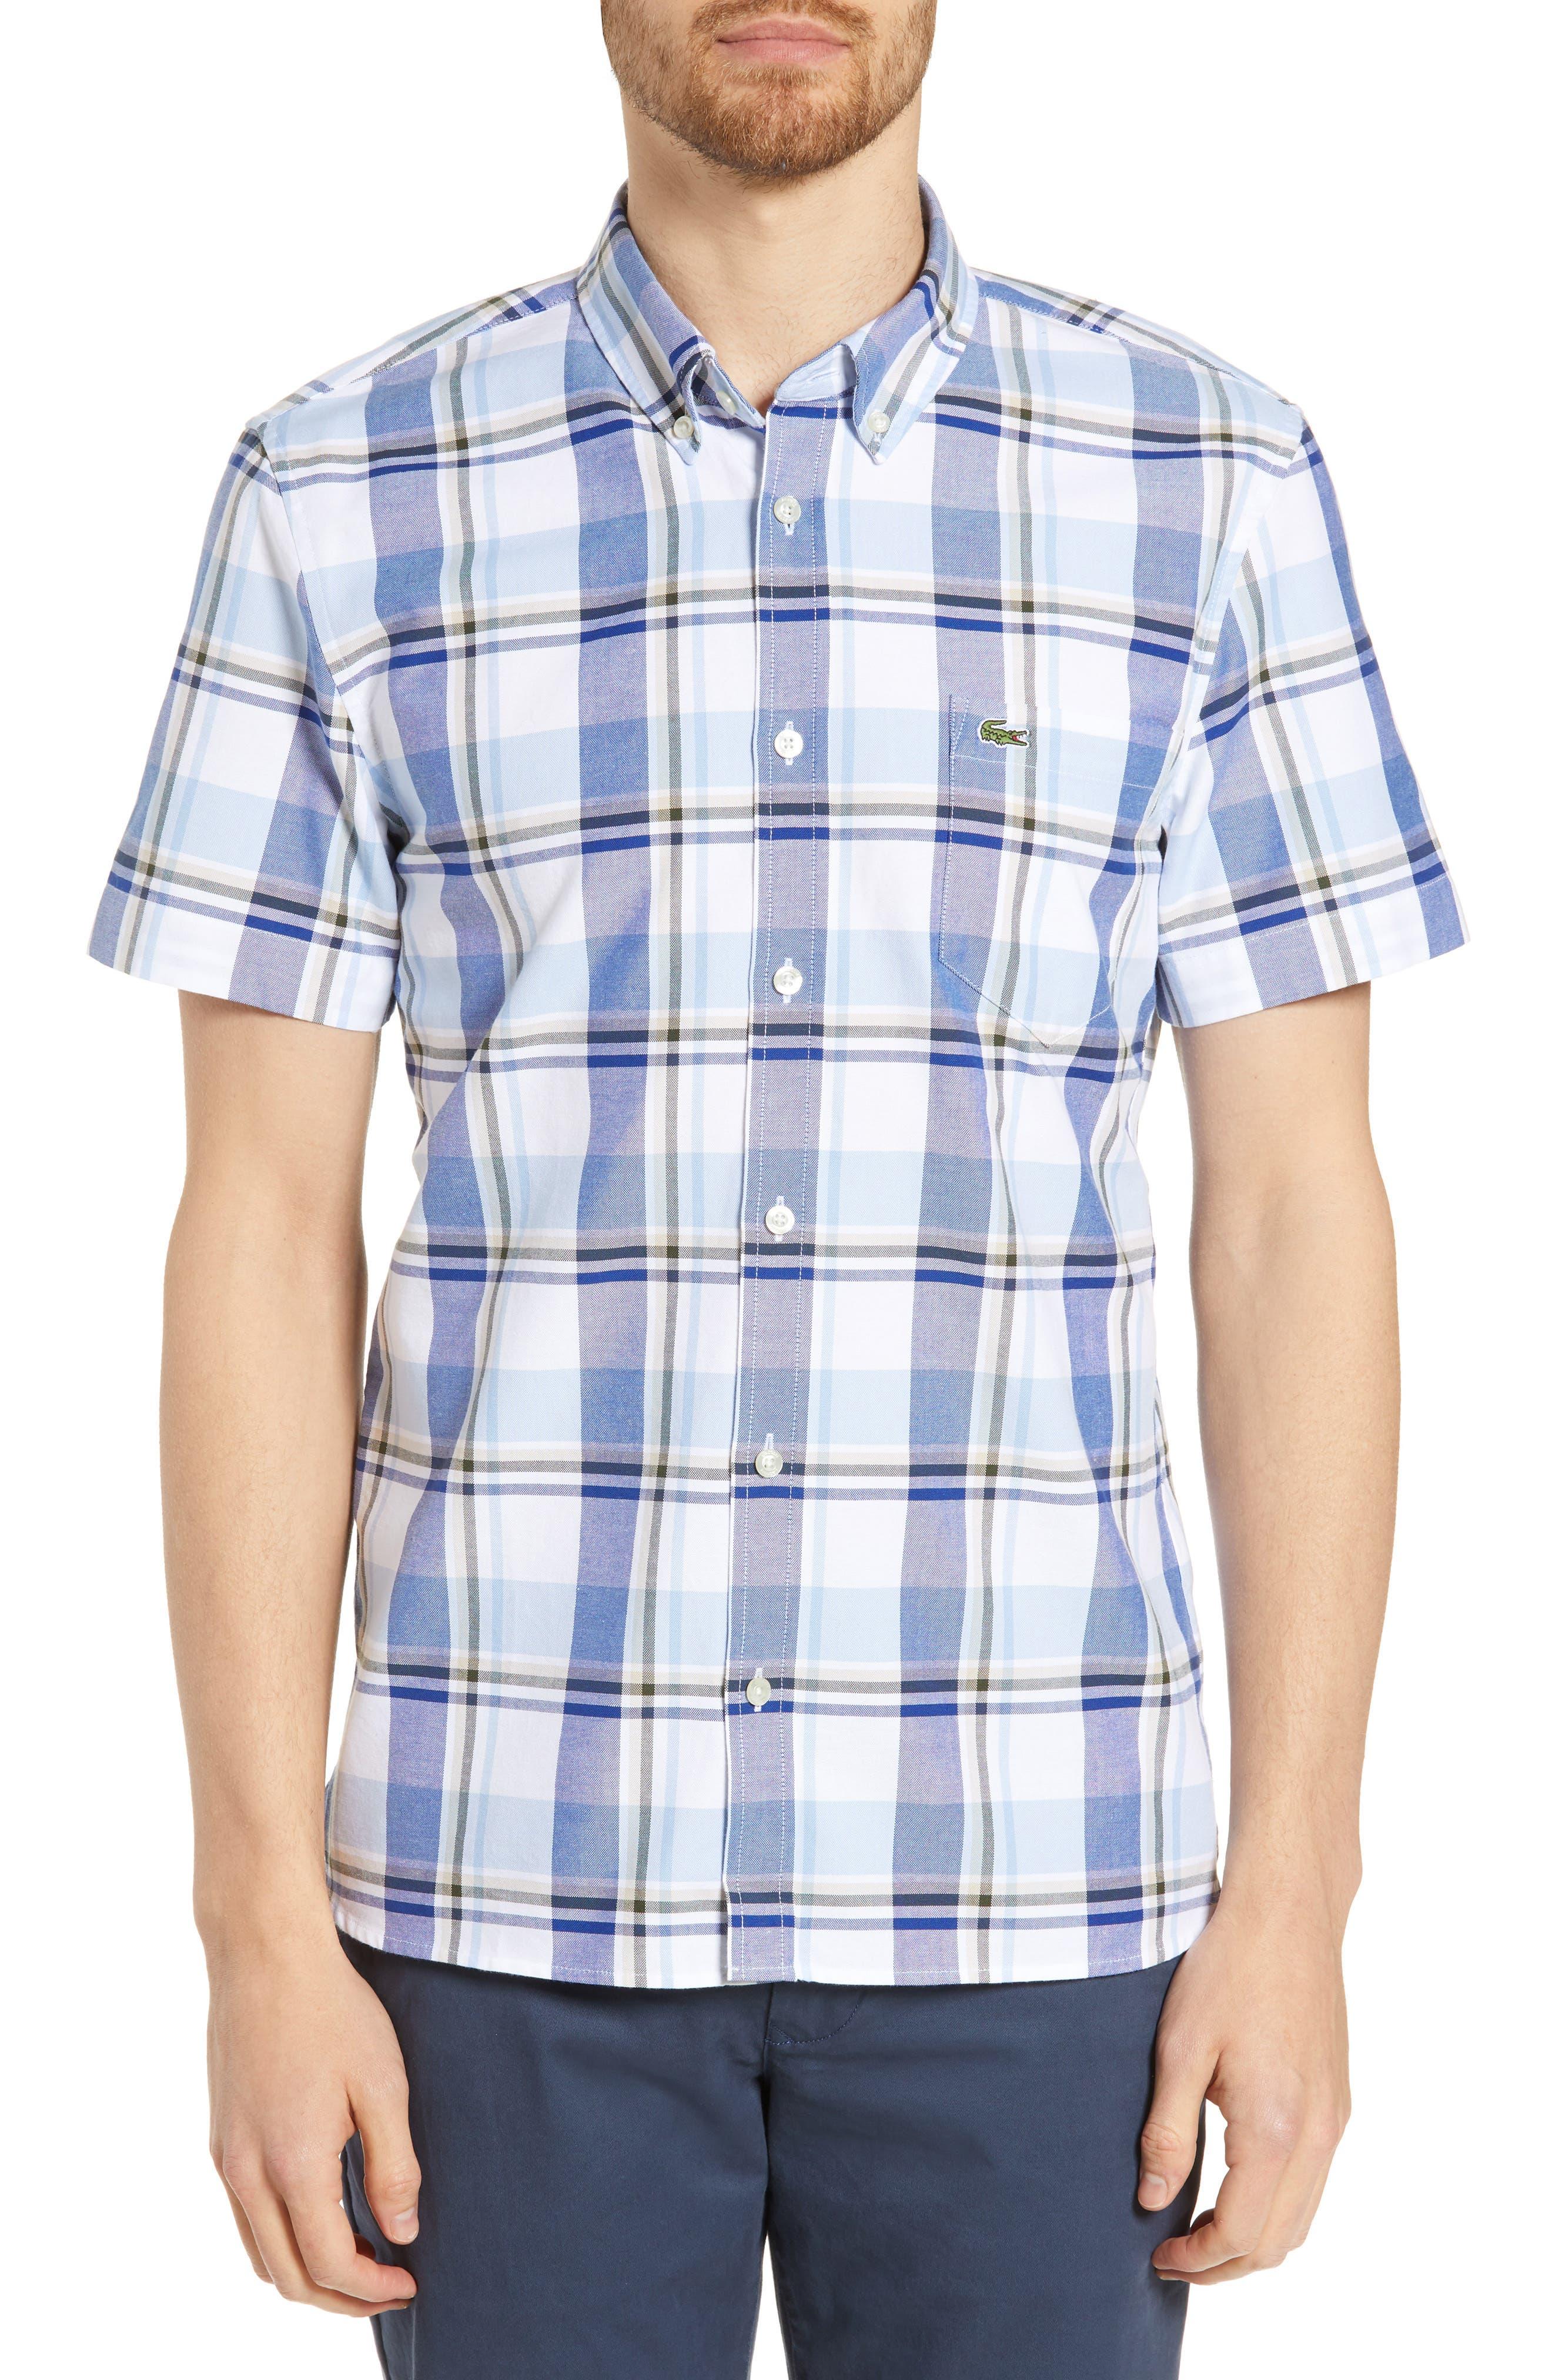 Lacoste Regular Fit Plaid Sport Shirt, Blue